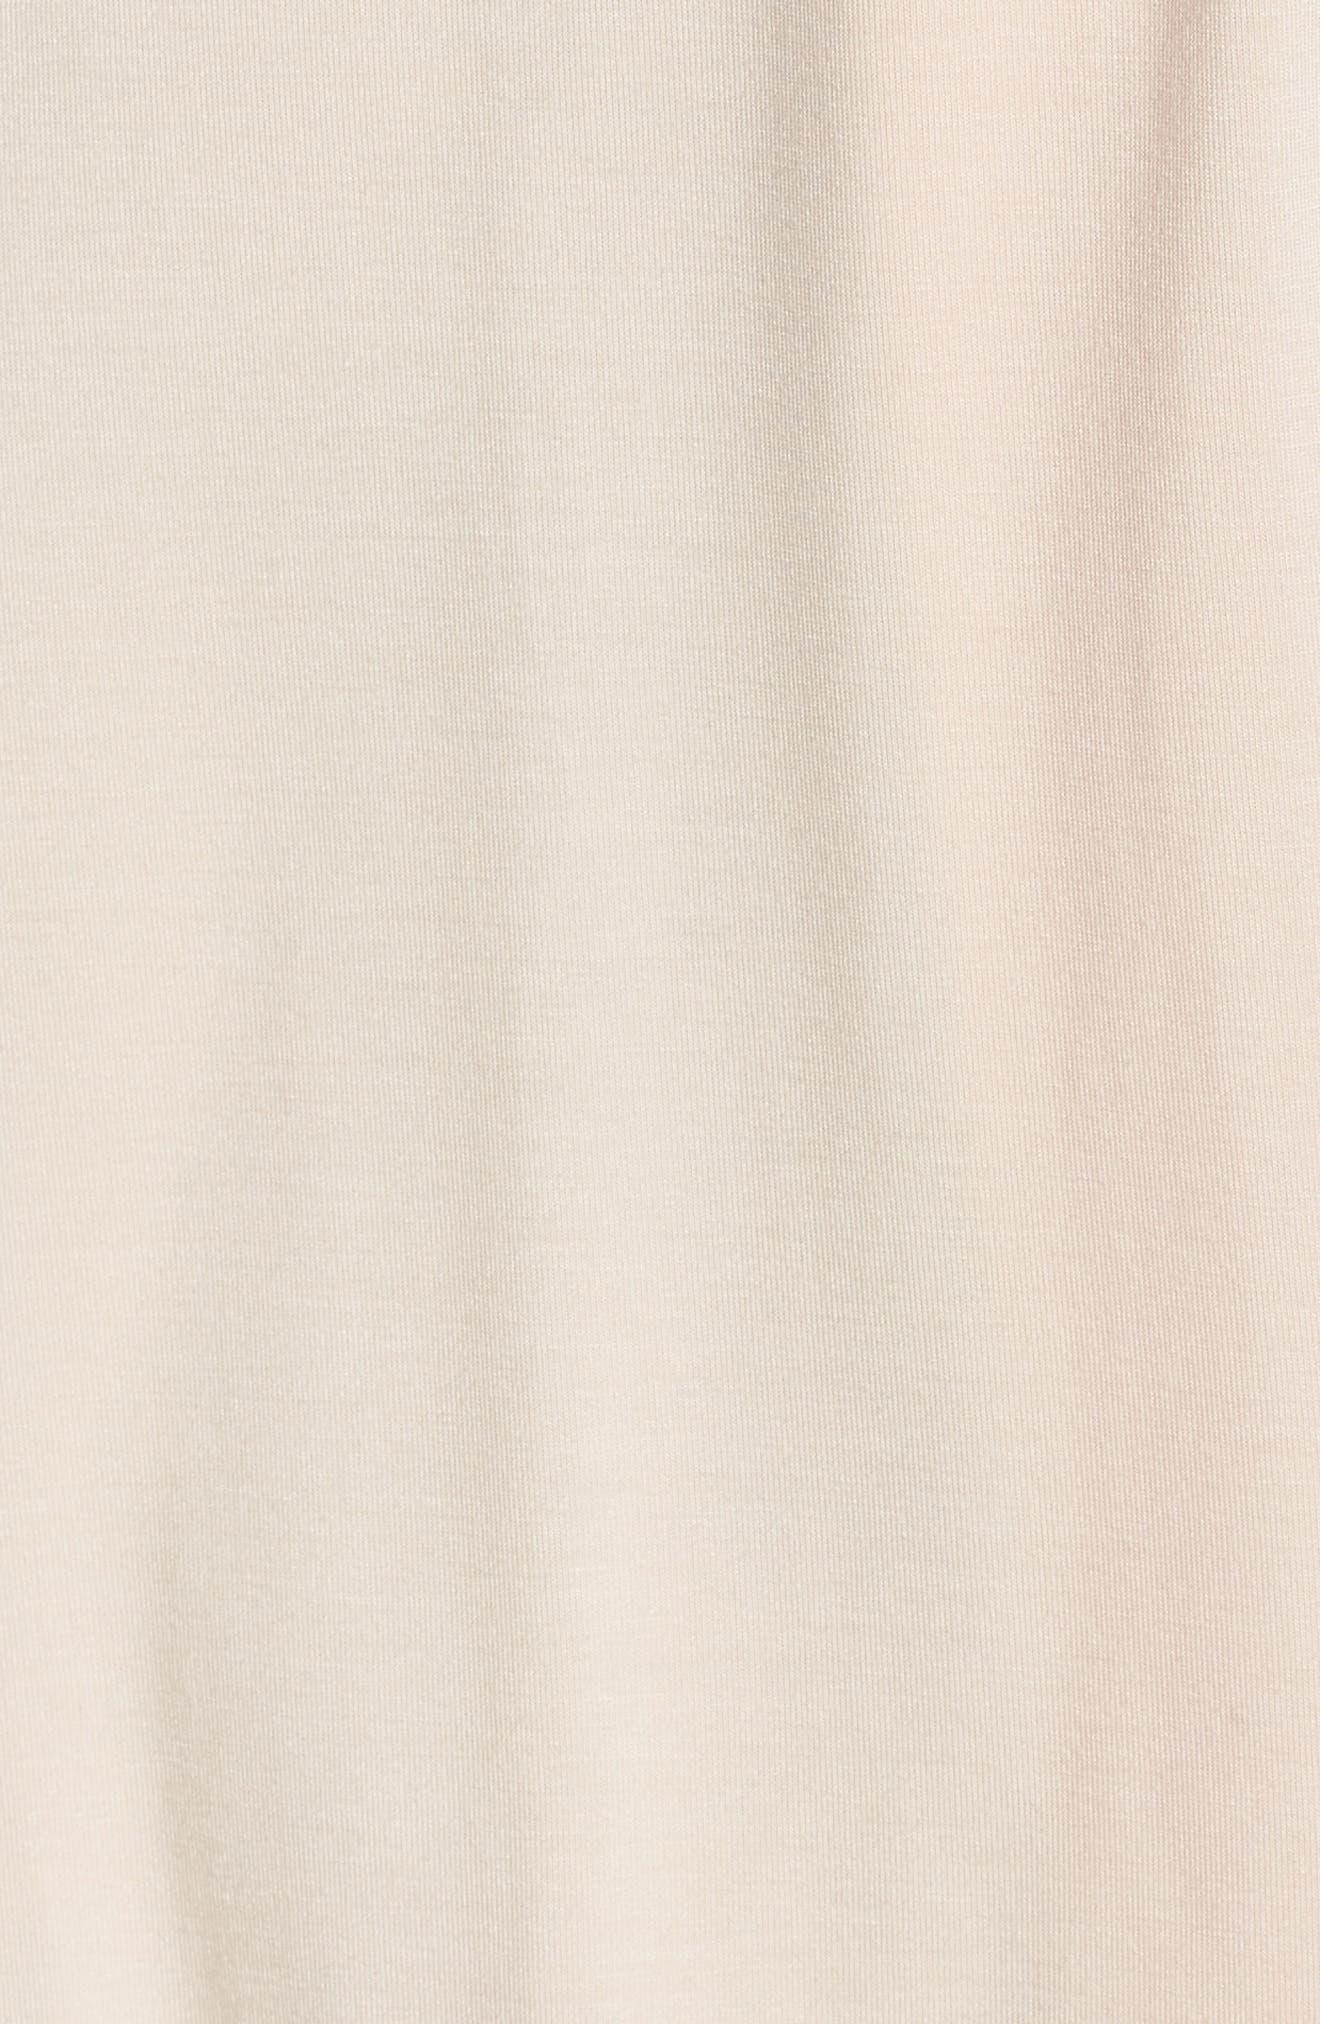 Serafina Kimono Robe,                             Alternate thumbnail 5, color,                             Pink